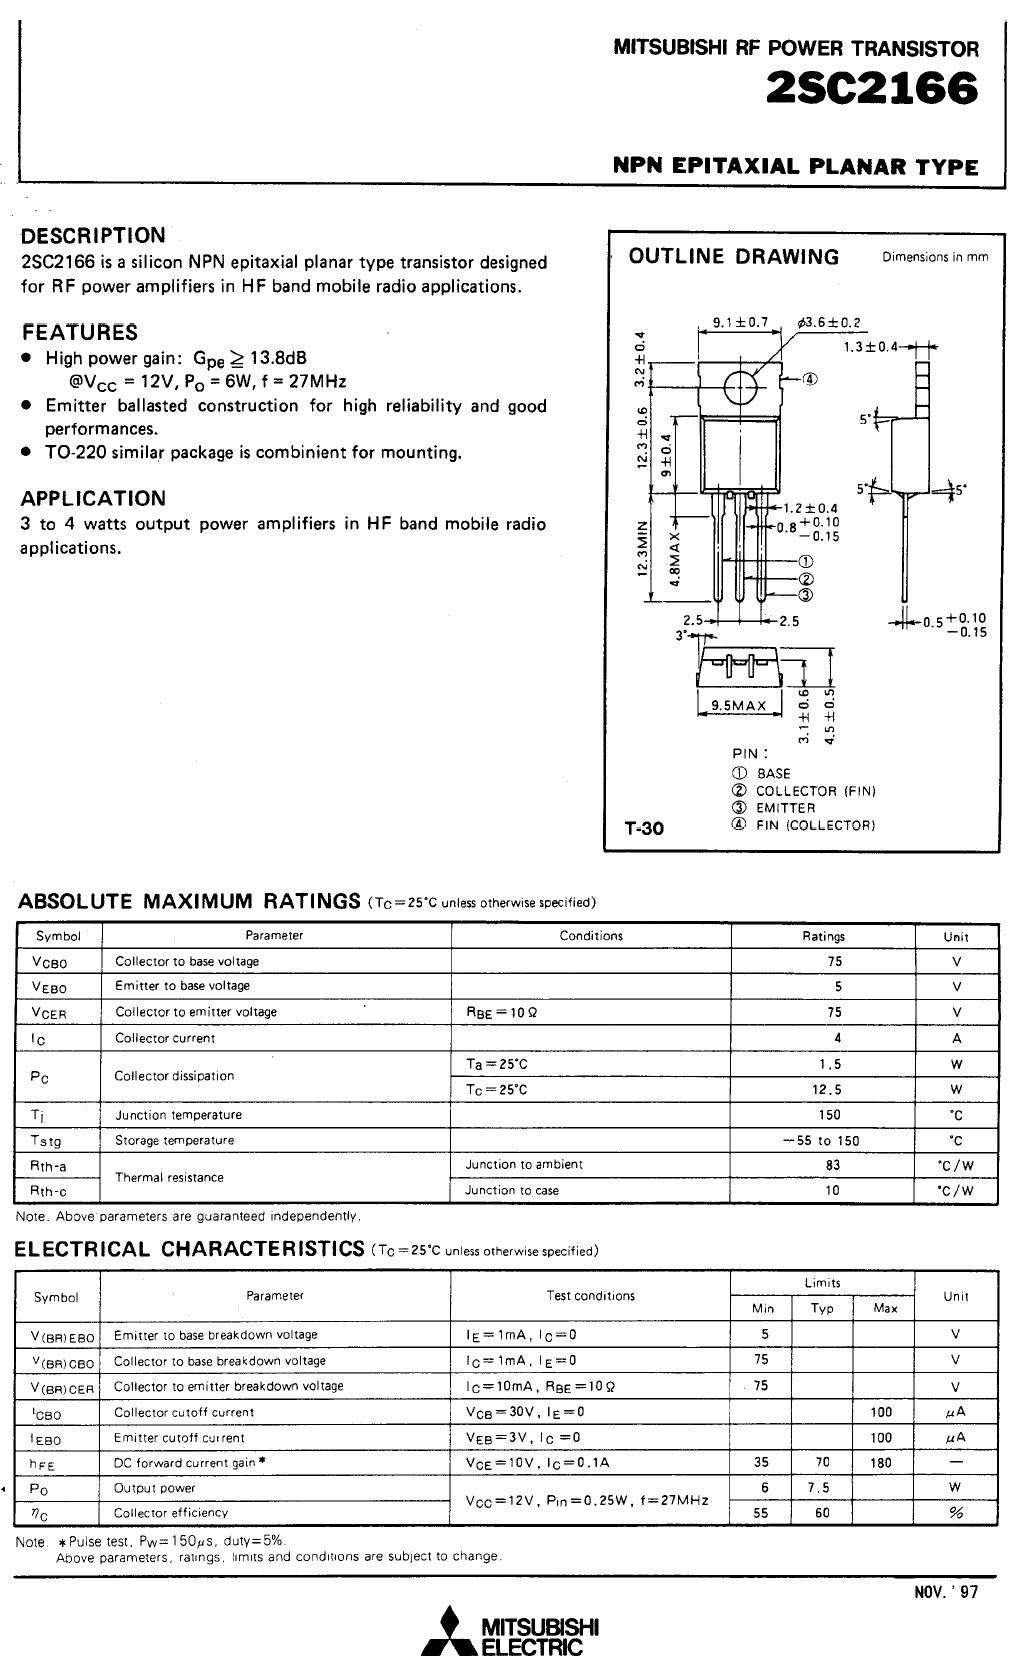 Tranzisztor NPN 75V 4A PQ>6W 27MHz HF-L 2SC2166-MIT 2SC2166-MIT -